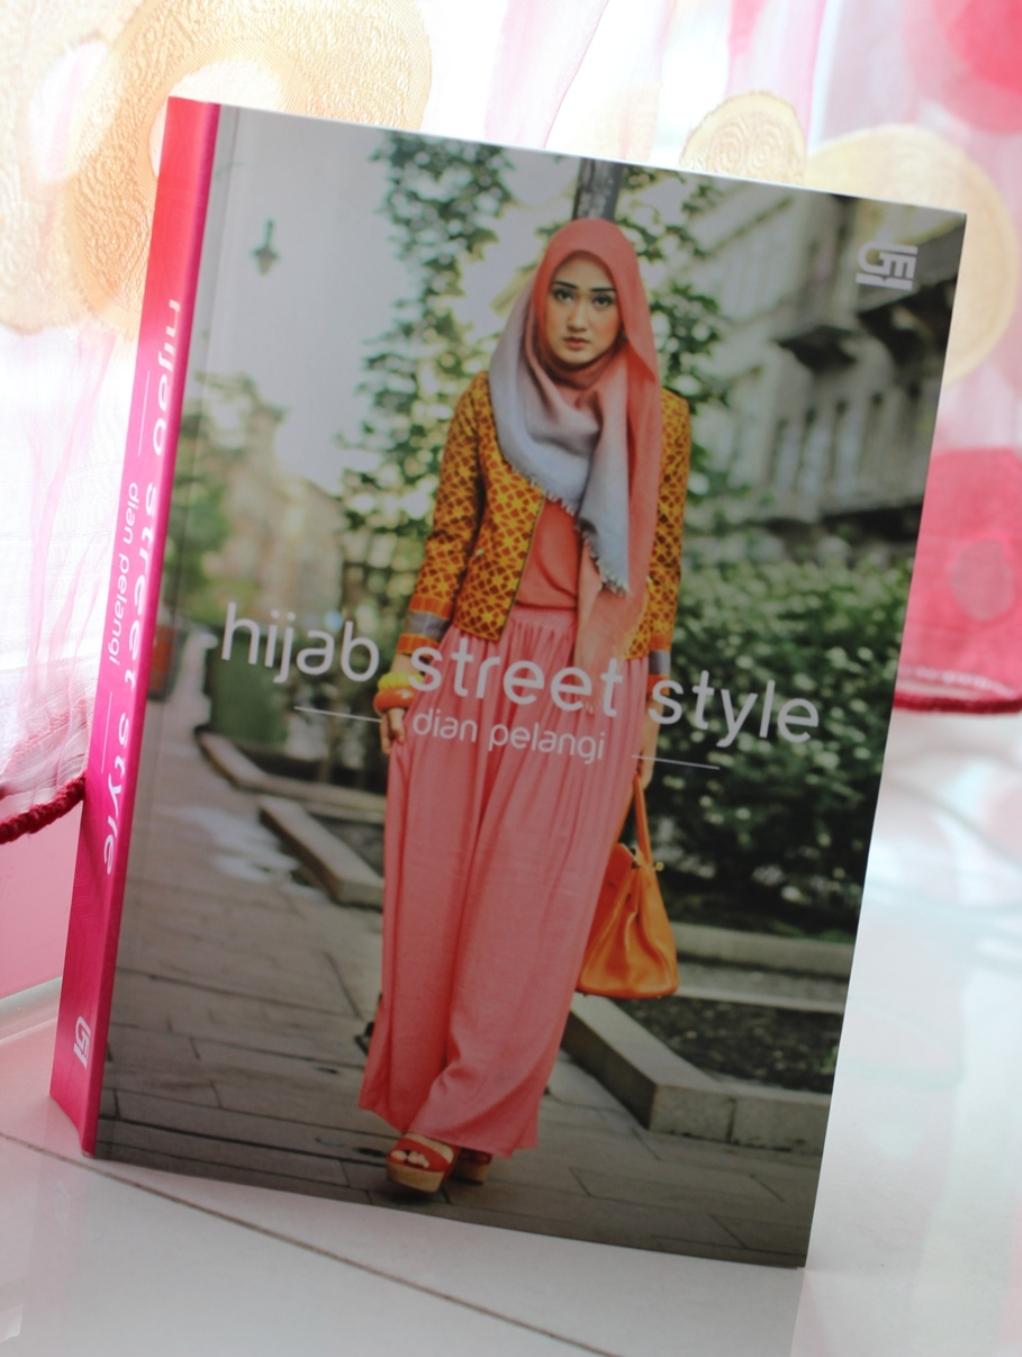 Mungkopas Dian Pelangi Hijab Street Style